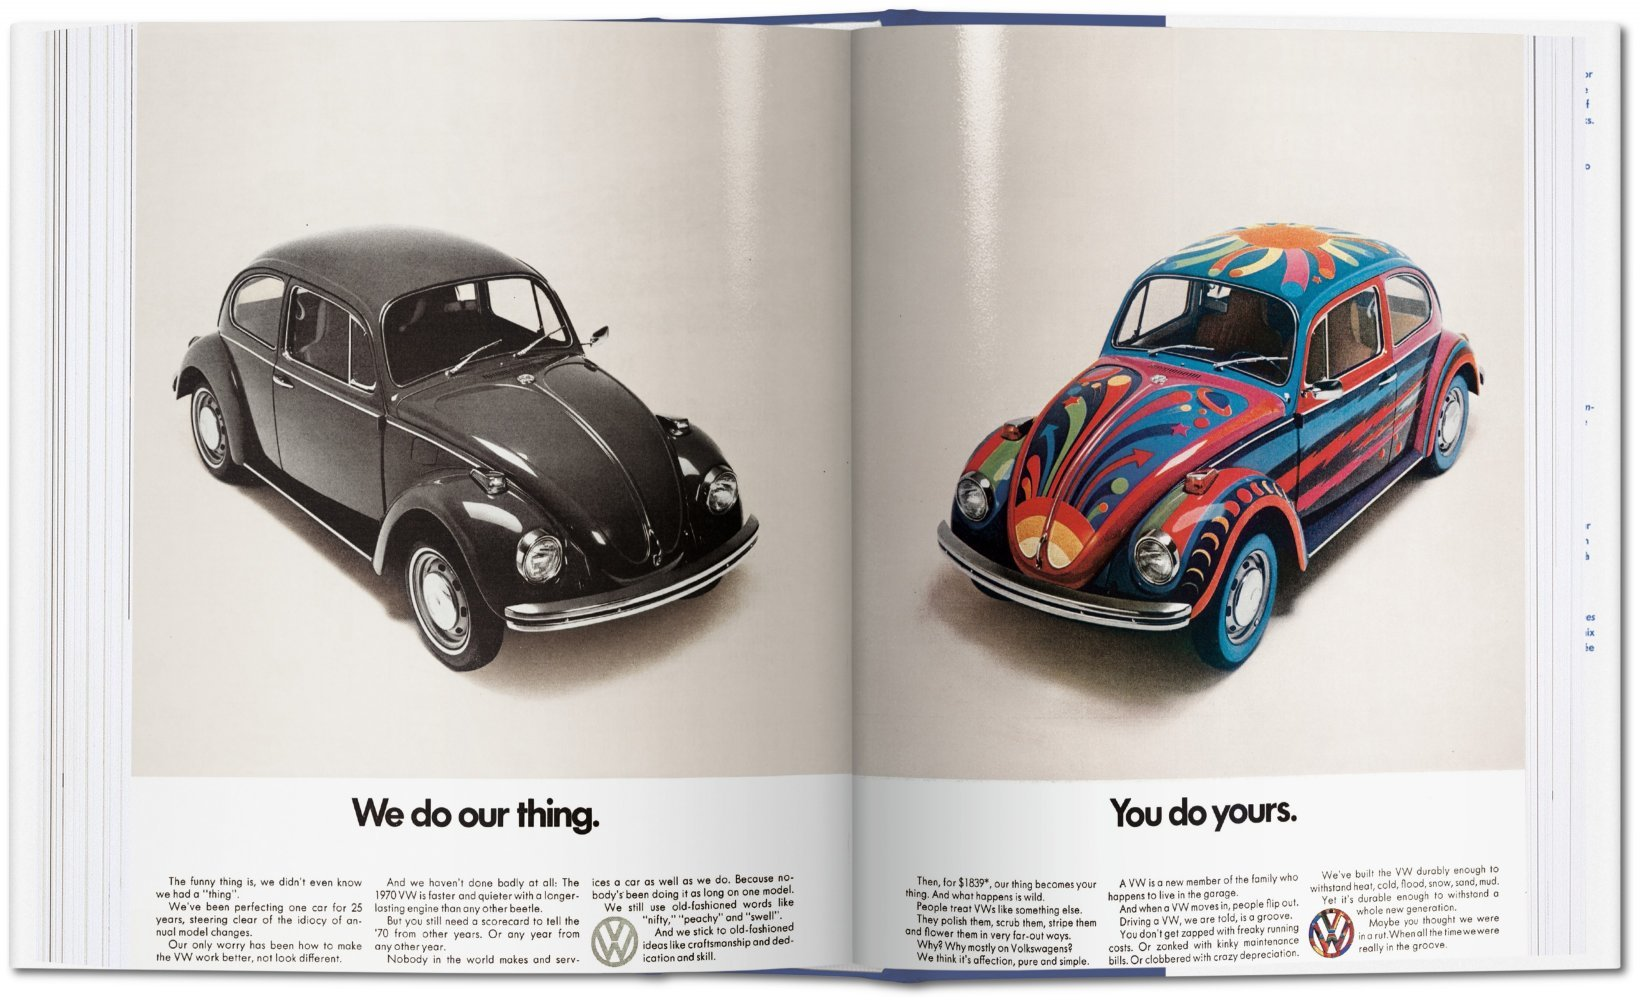 classic_cars_20th_cent_hc_ko_int_open_0464_0465_05414_1507291133_id_675302